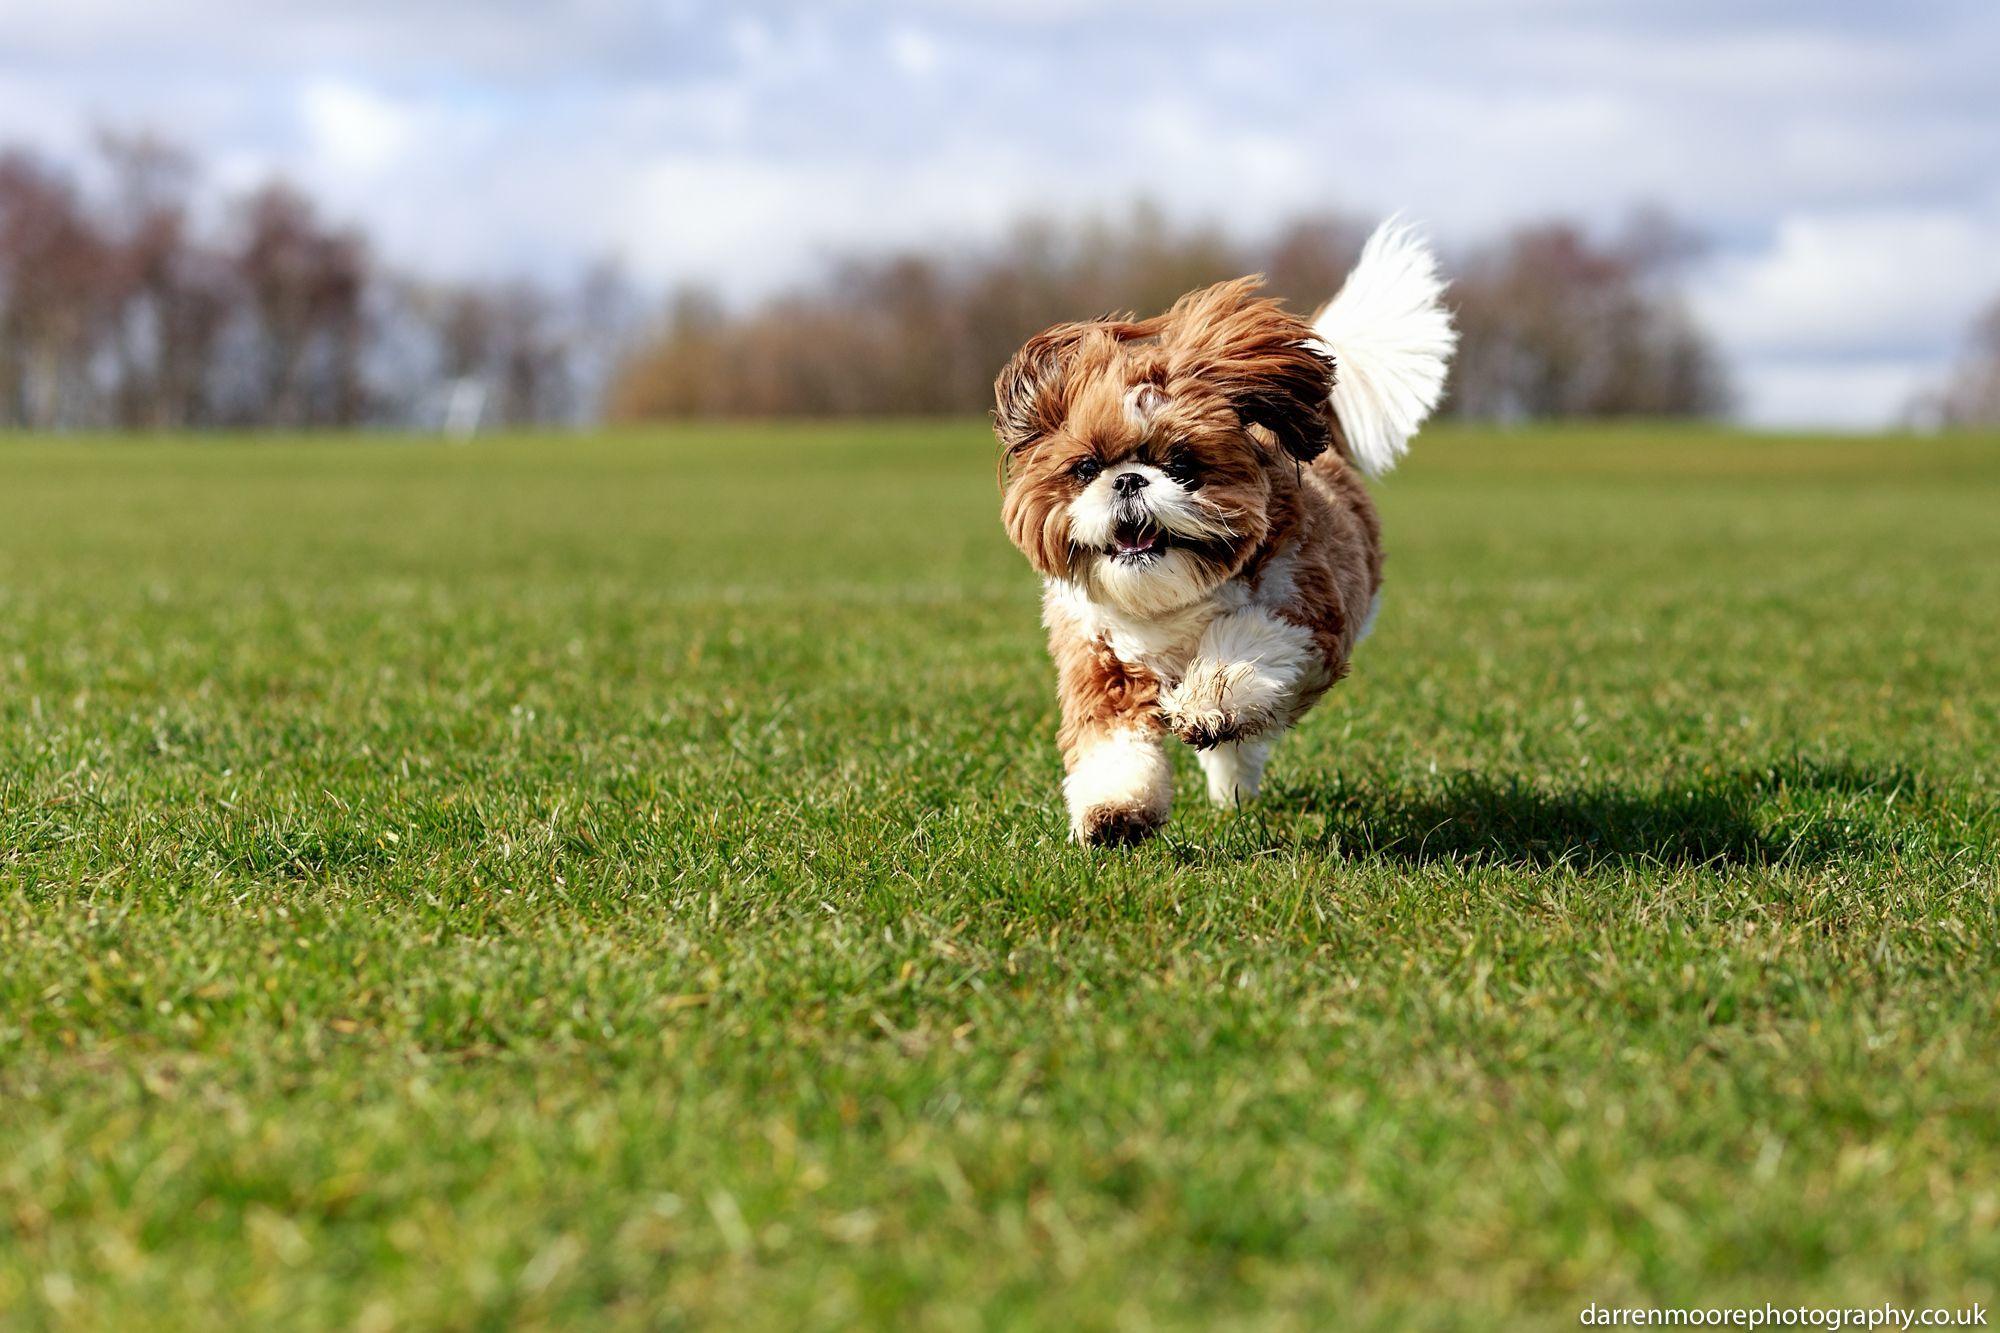 Book Your Shih Tzu Dog Photoshoot Today Shih Tzu Shih Tzu Photos Dog Photogra In 2020 Shih Tzu Dog Dog Photograph Dog Photoshoot